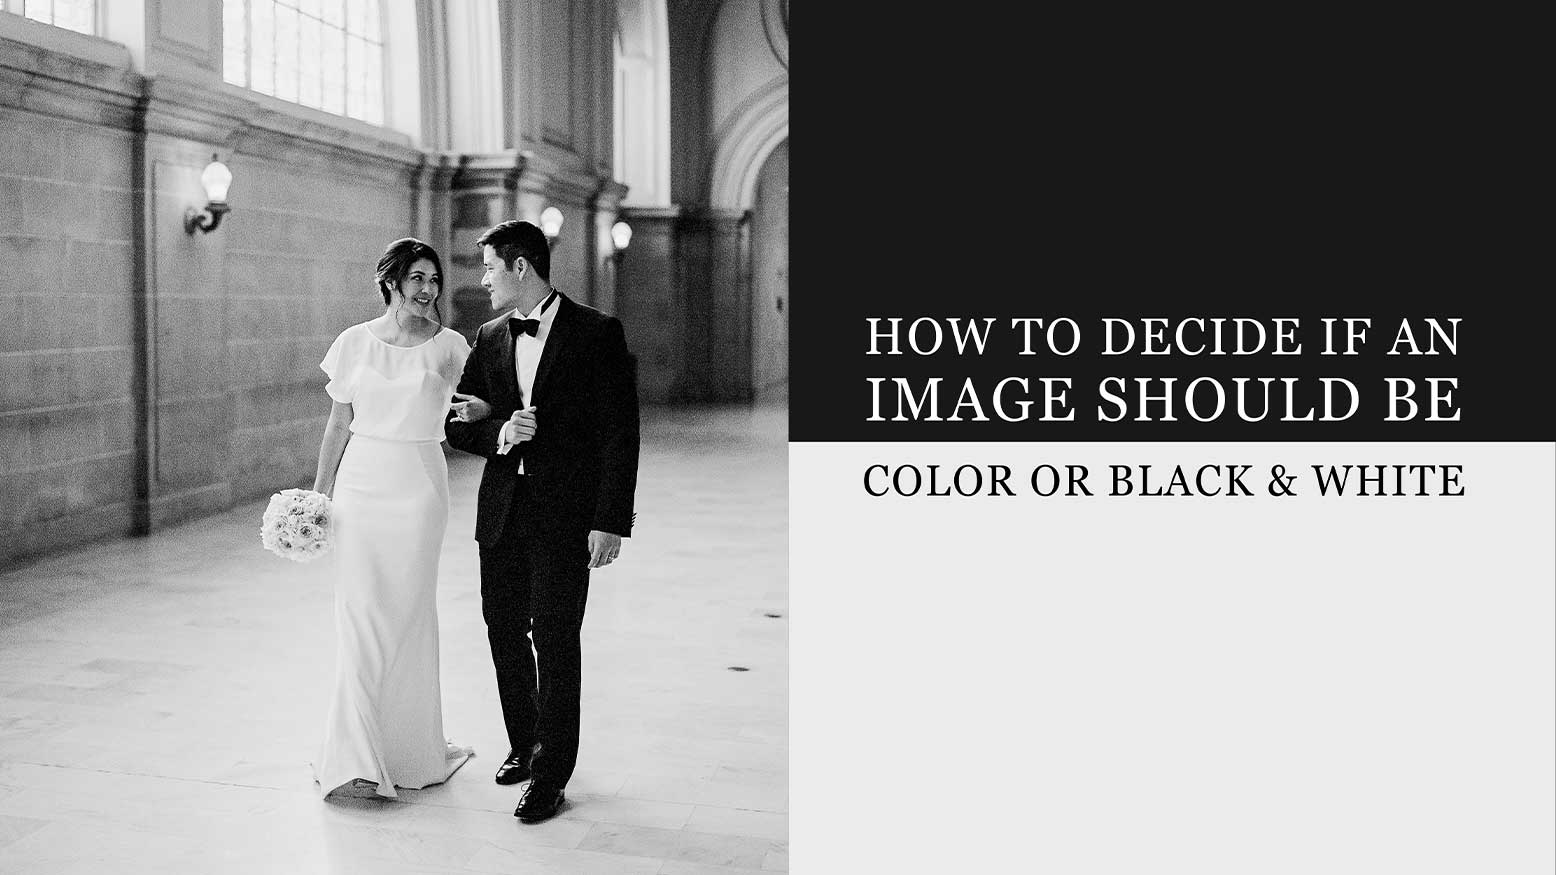 Color or Black & White